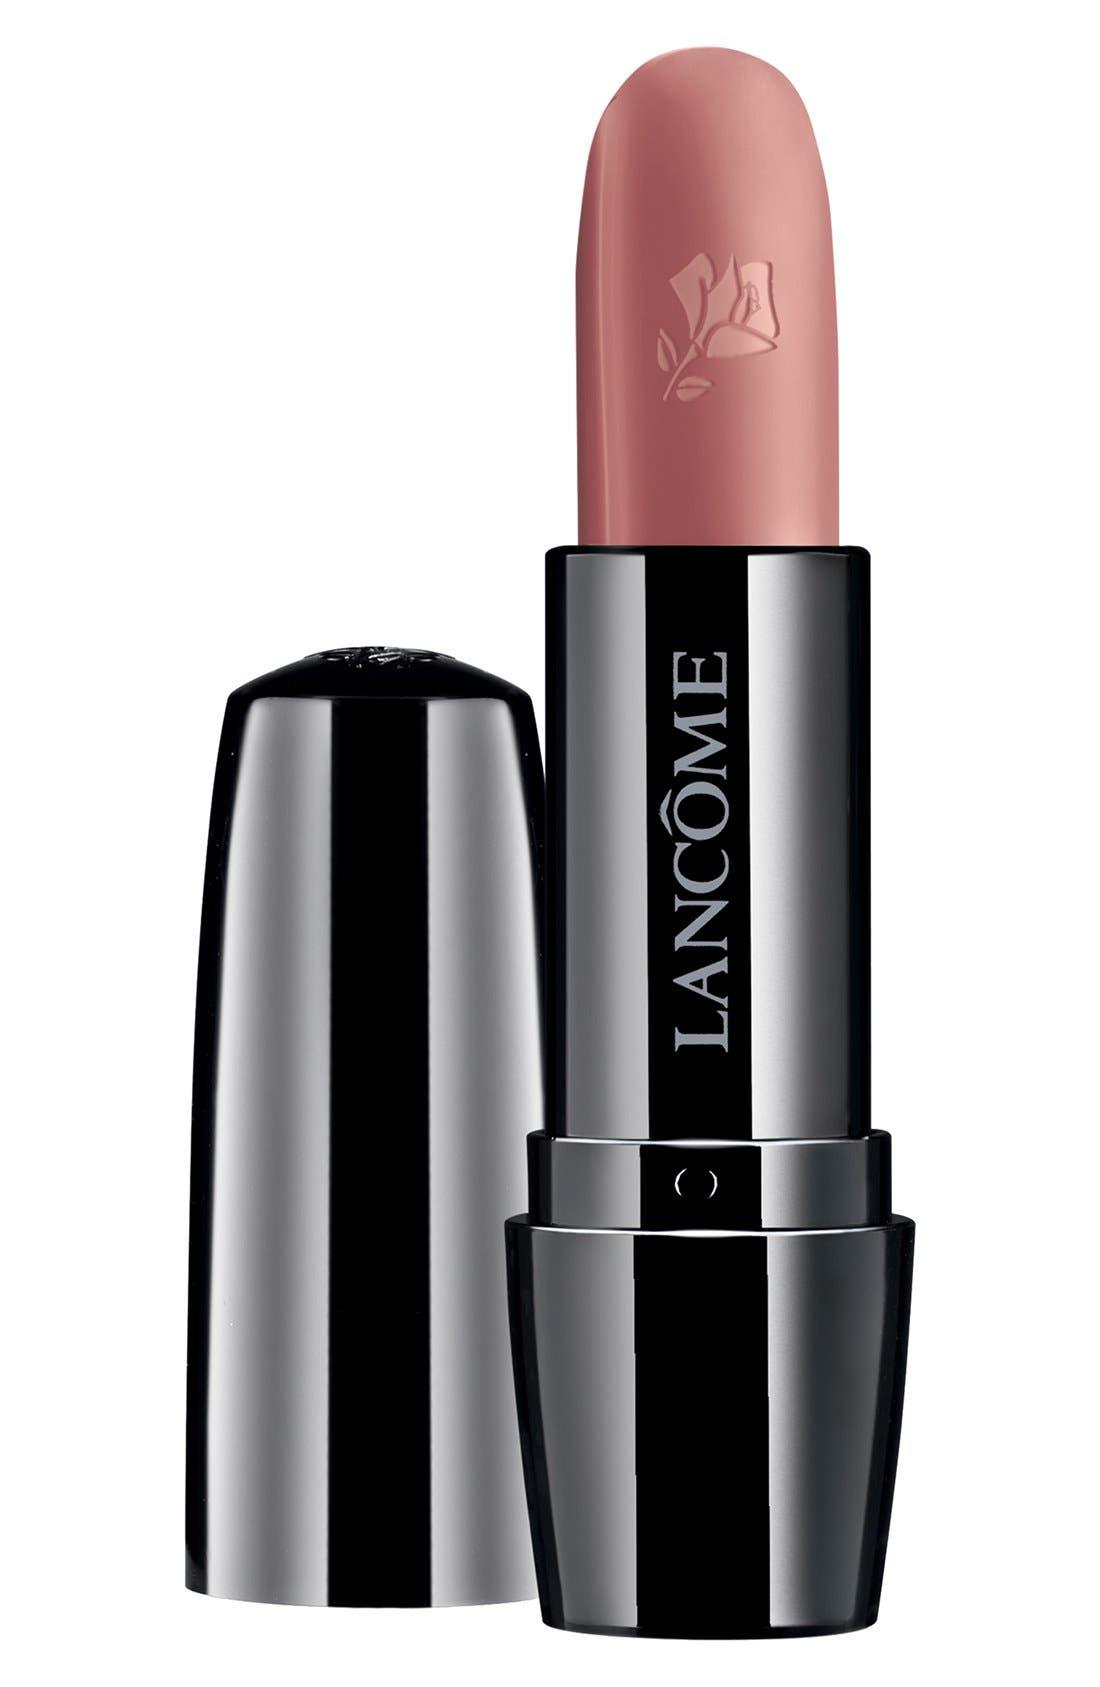 Lancôme Color Design Lipstick